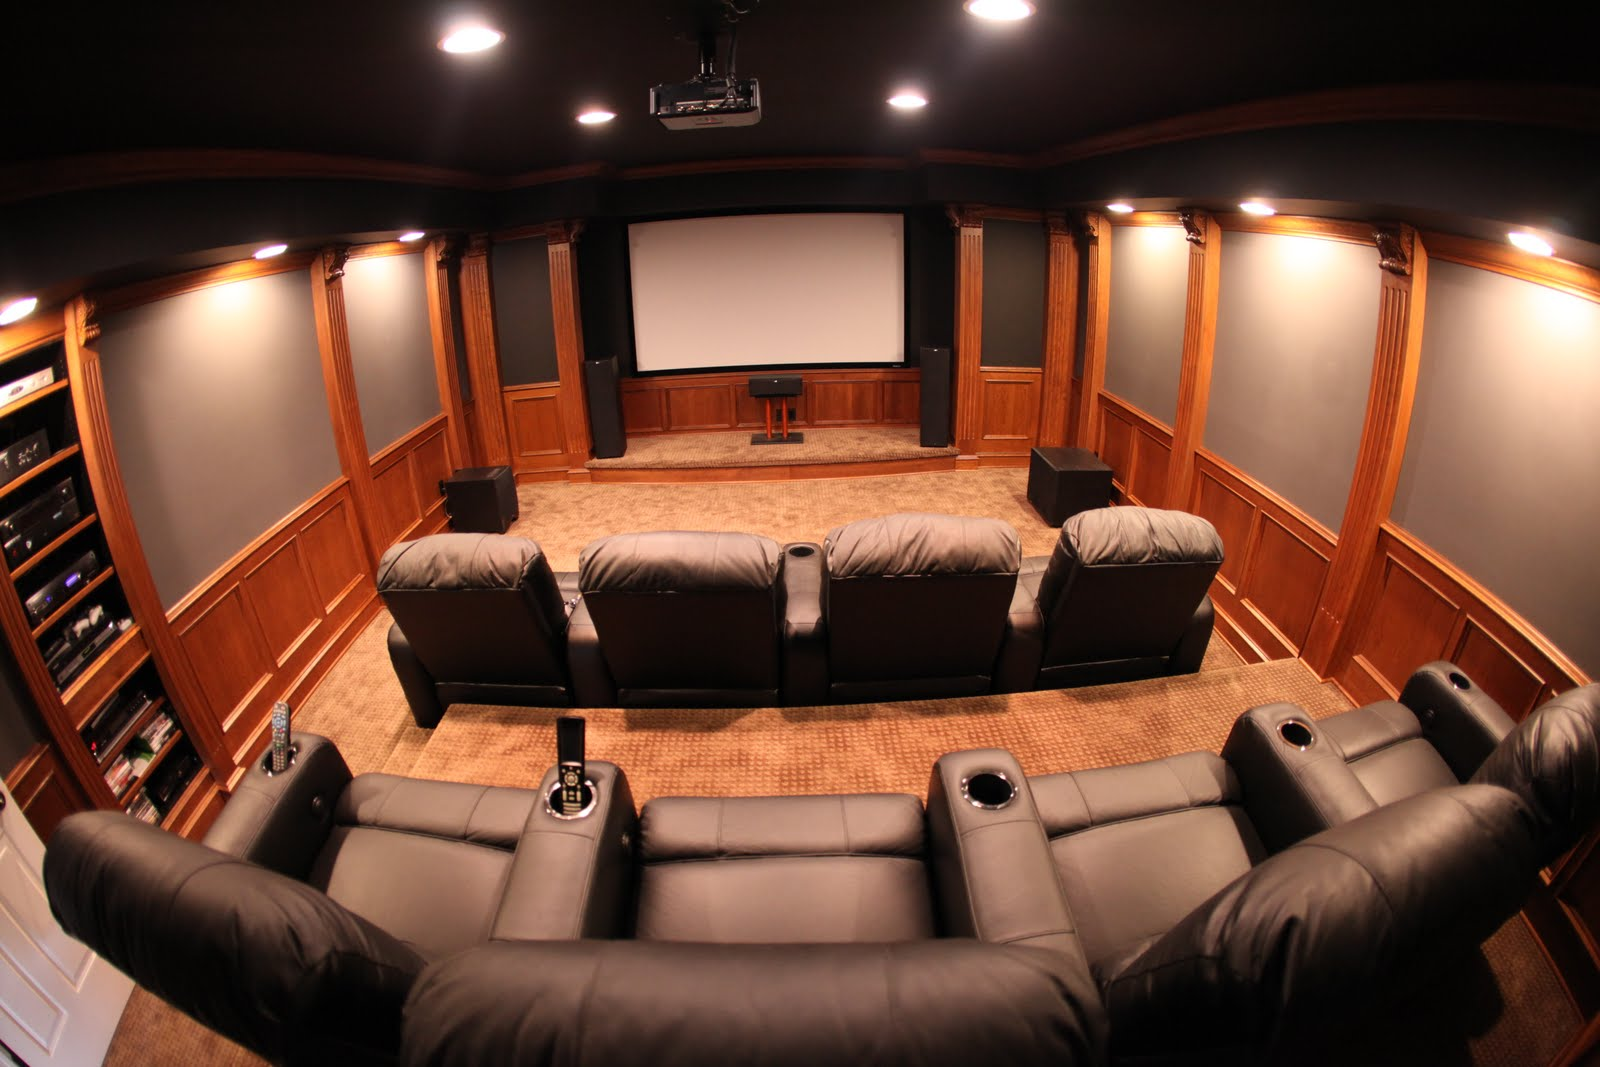 MHI Interiors: Theater Room